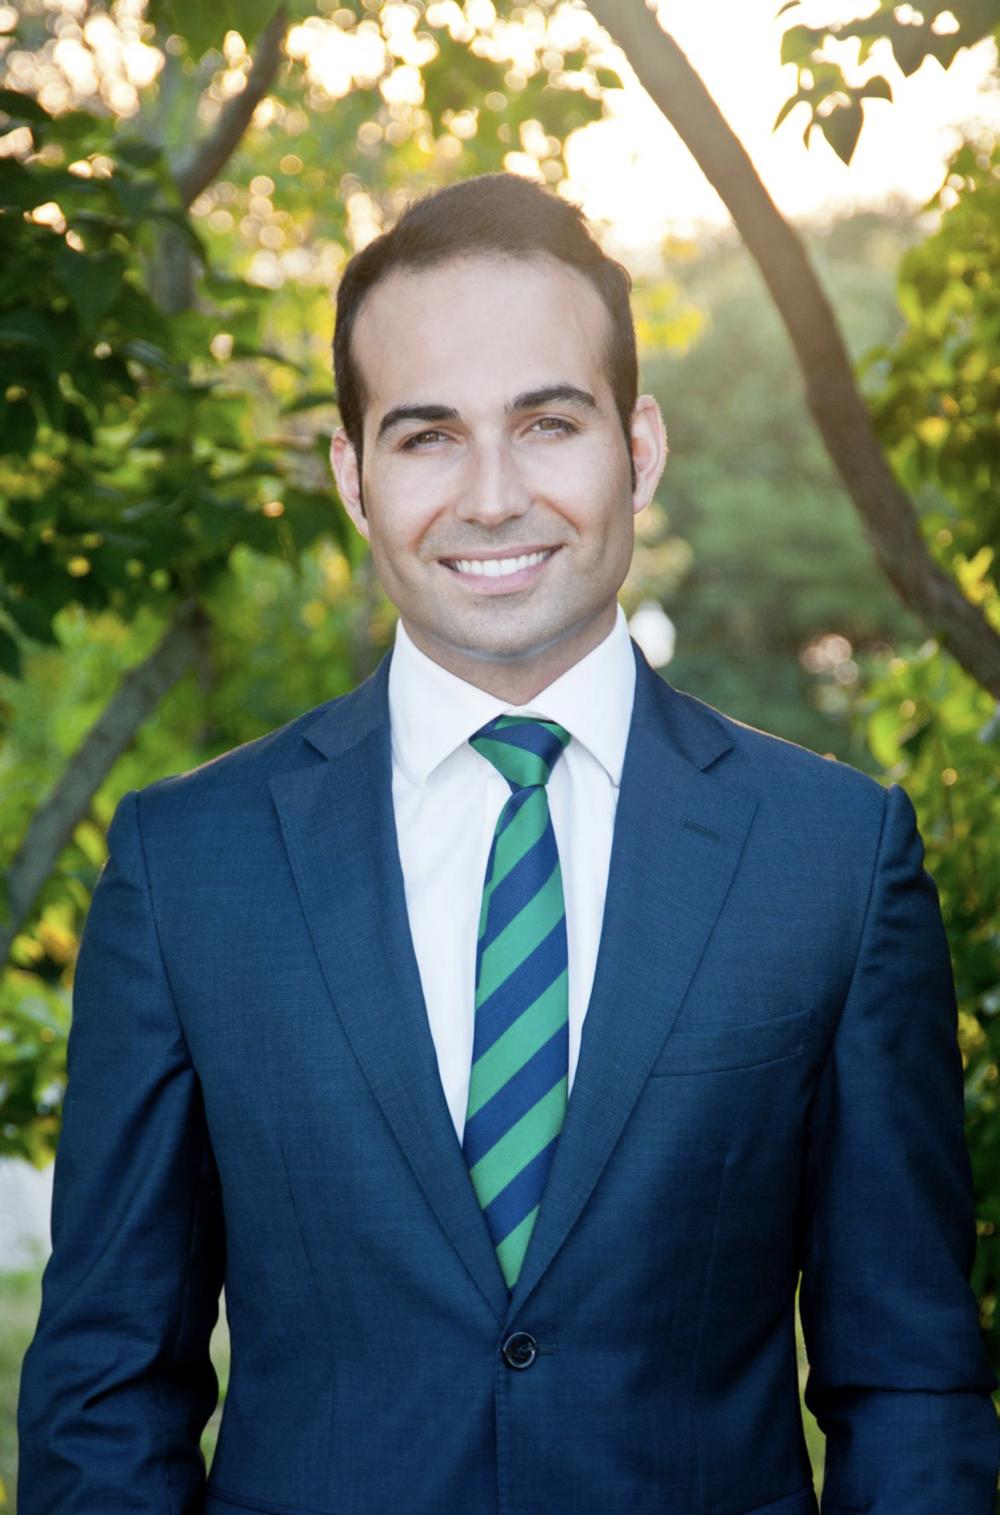 alvaro Ortega - Chief Financial Officer, Vineyard Wind